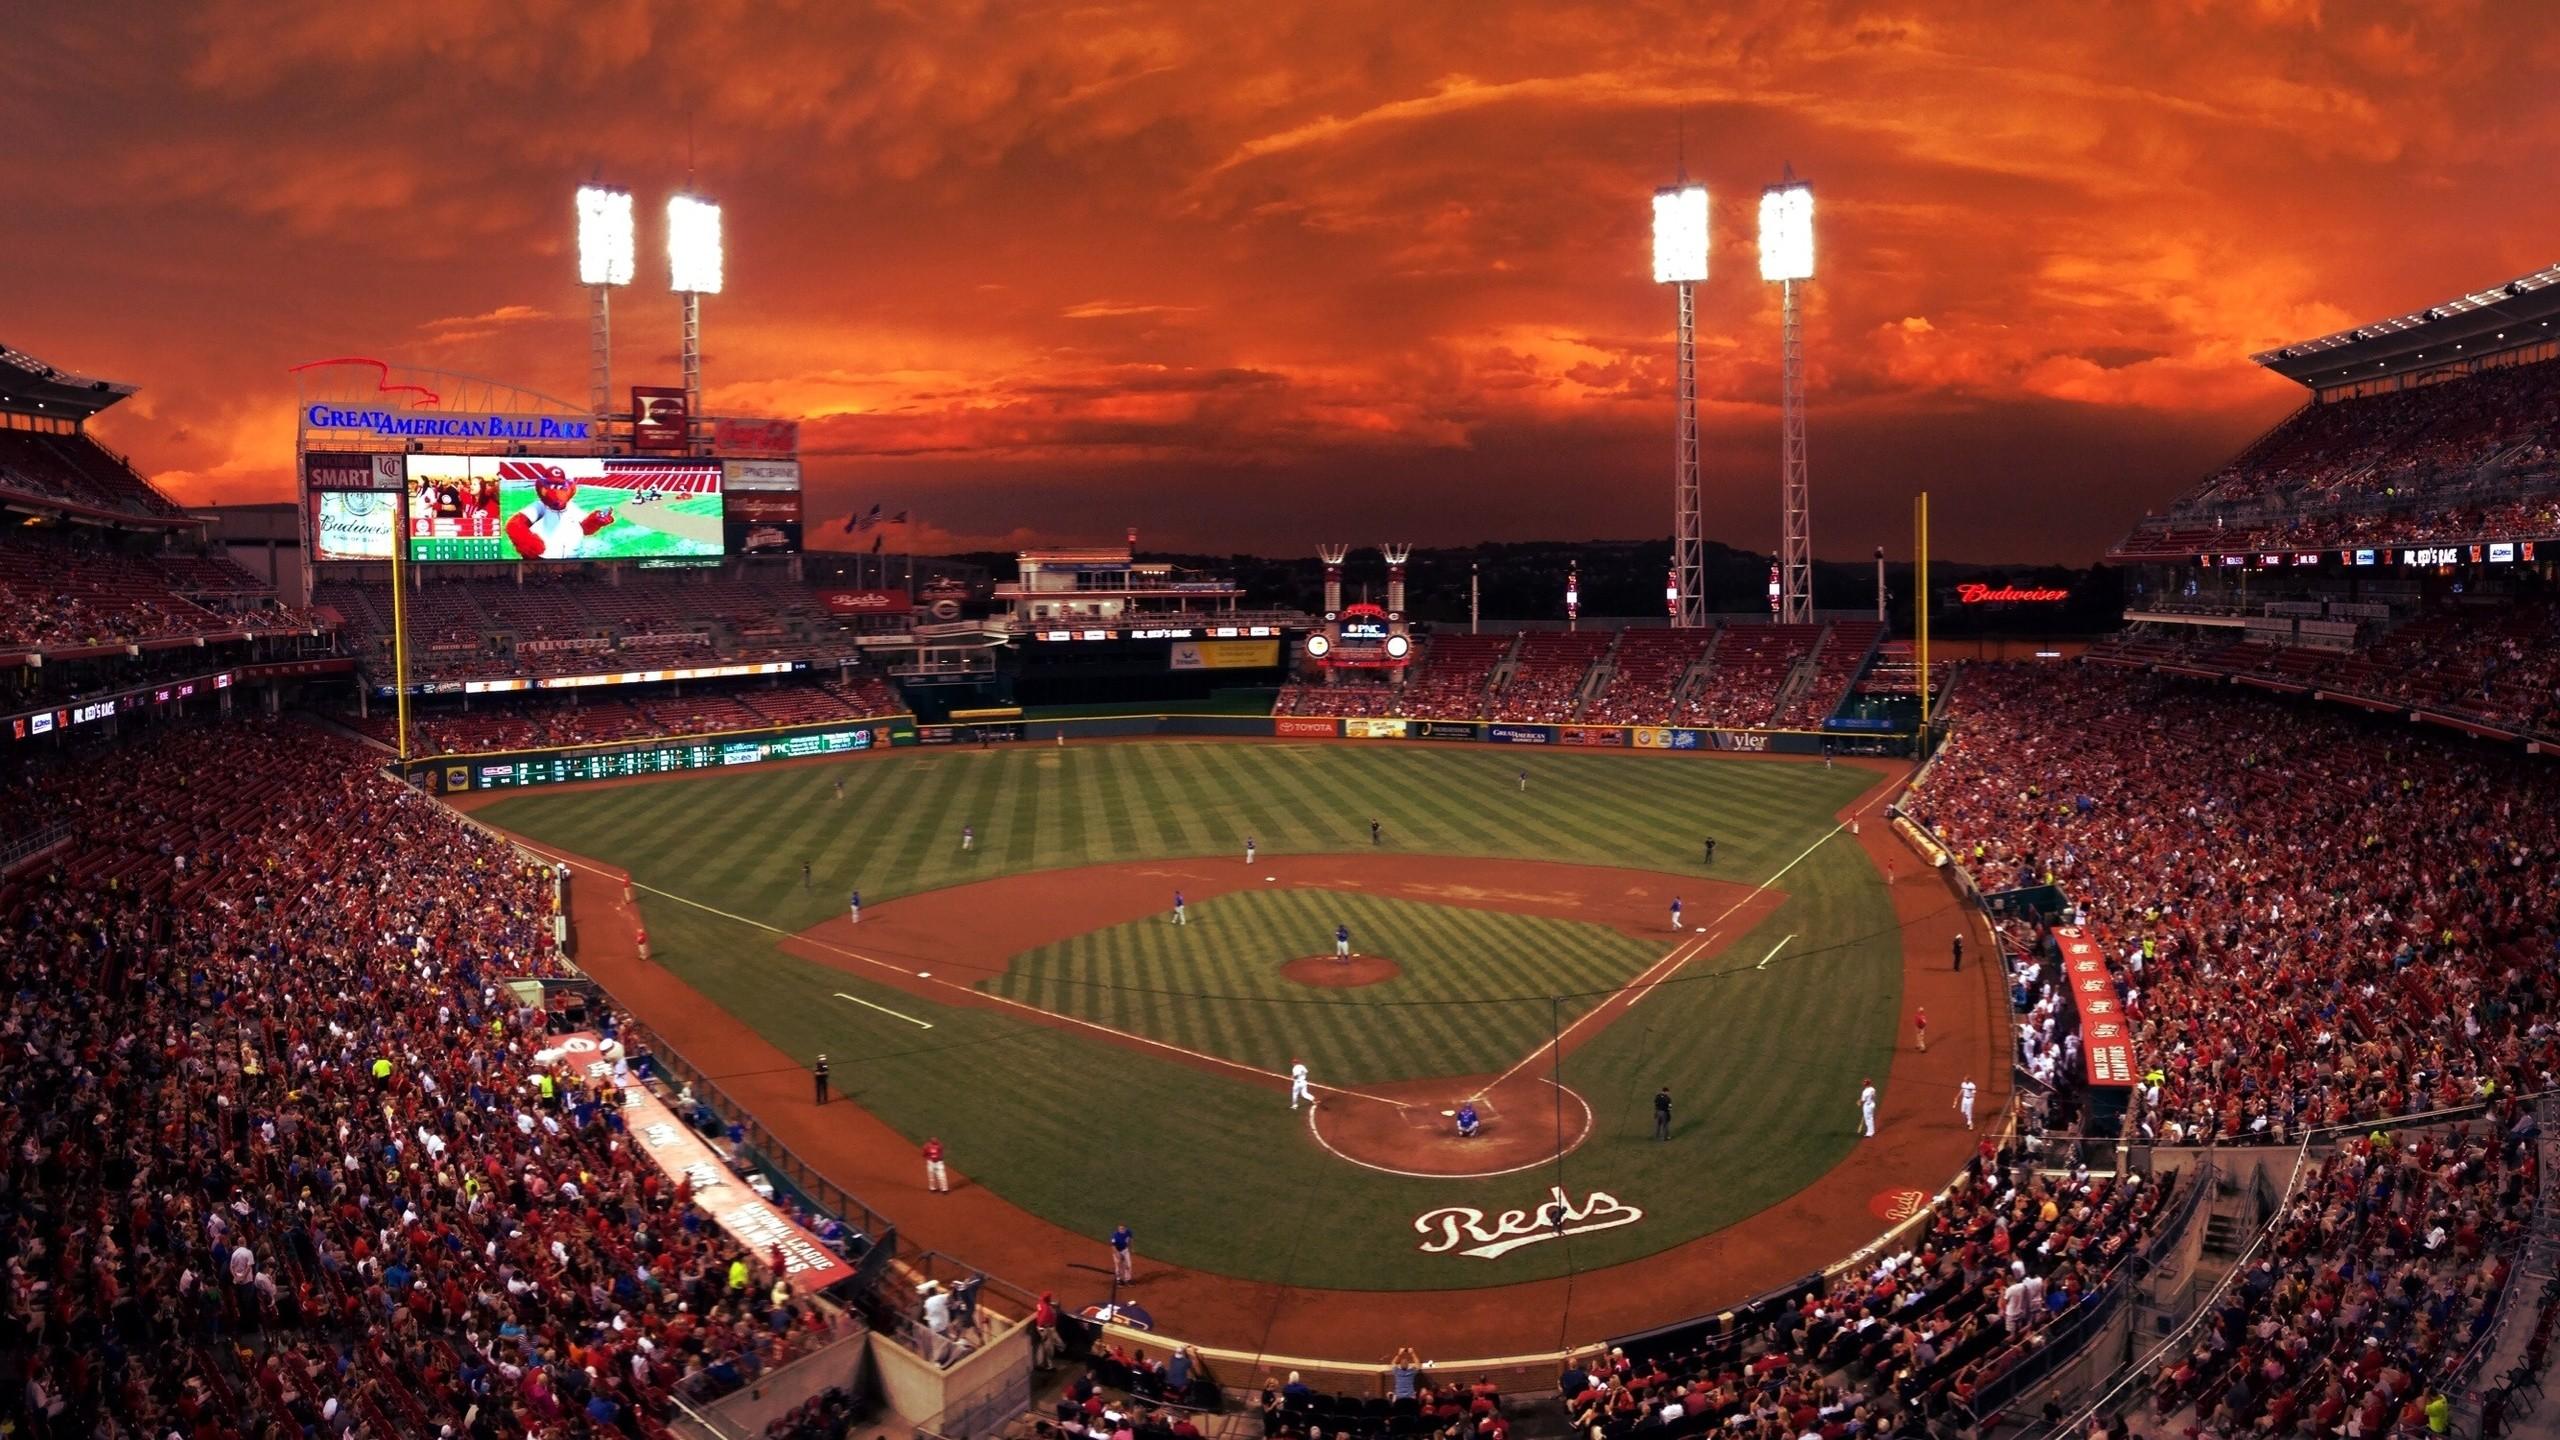 Res: 2560x1440, Cincinnati Reds Background.